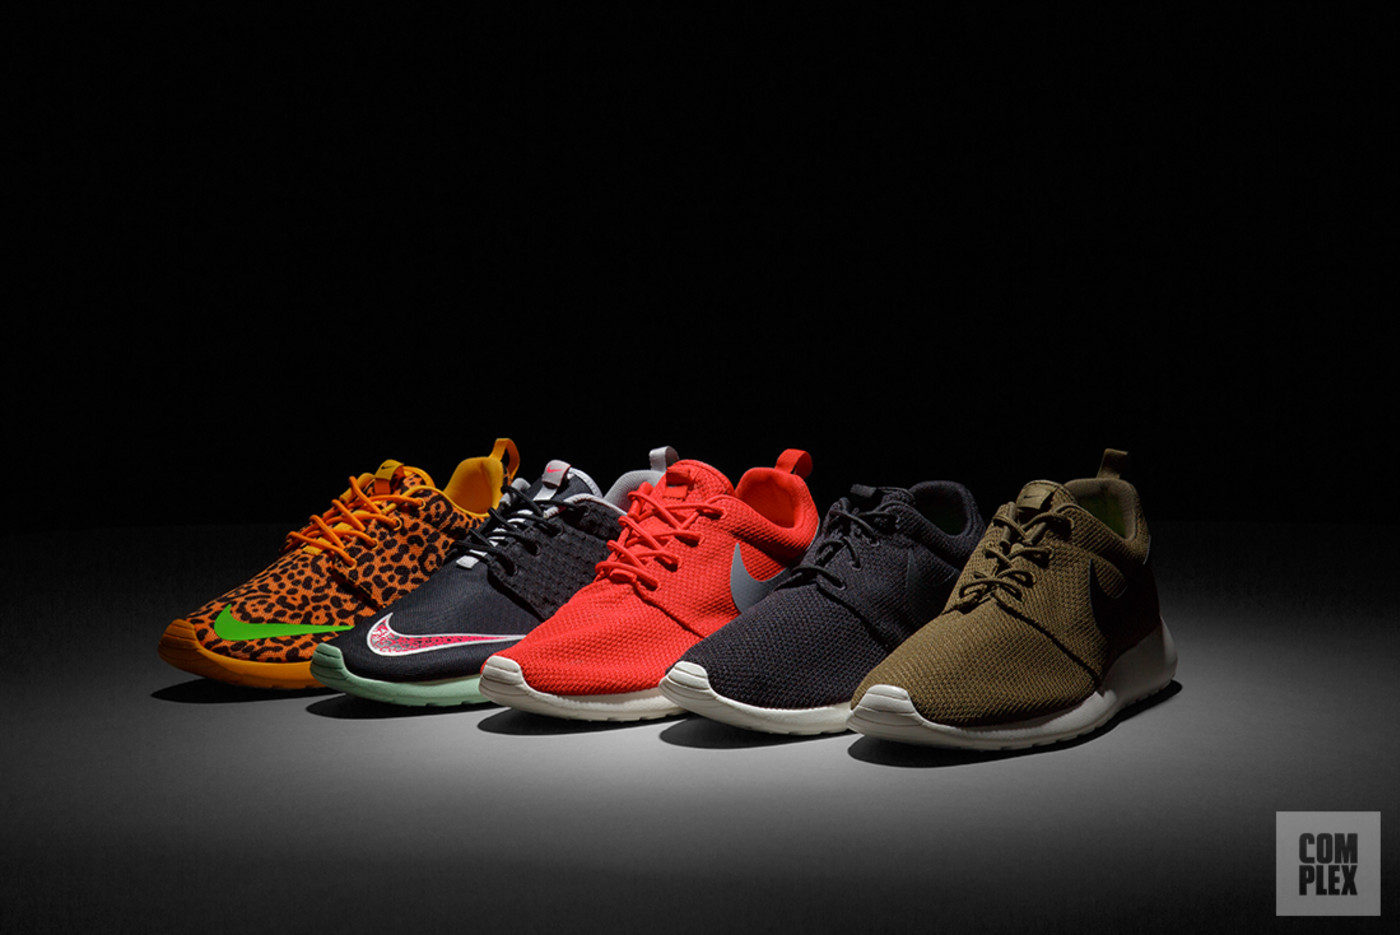 Reunir Joya Agacharse  The Rise and Fall of the Nike Roshe Run | Complex